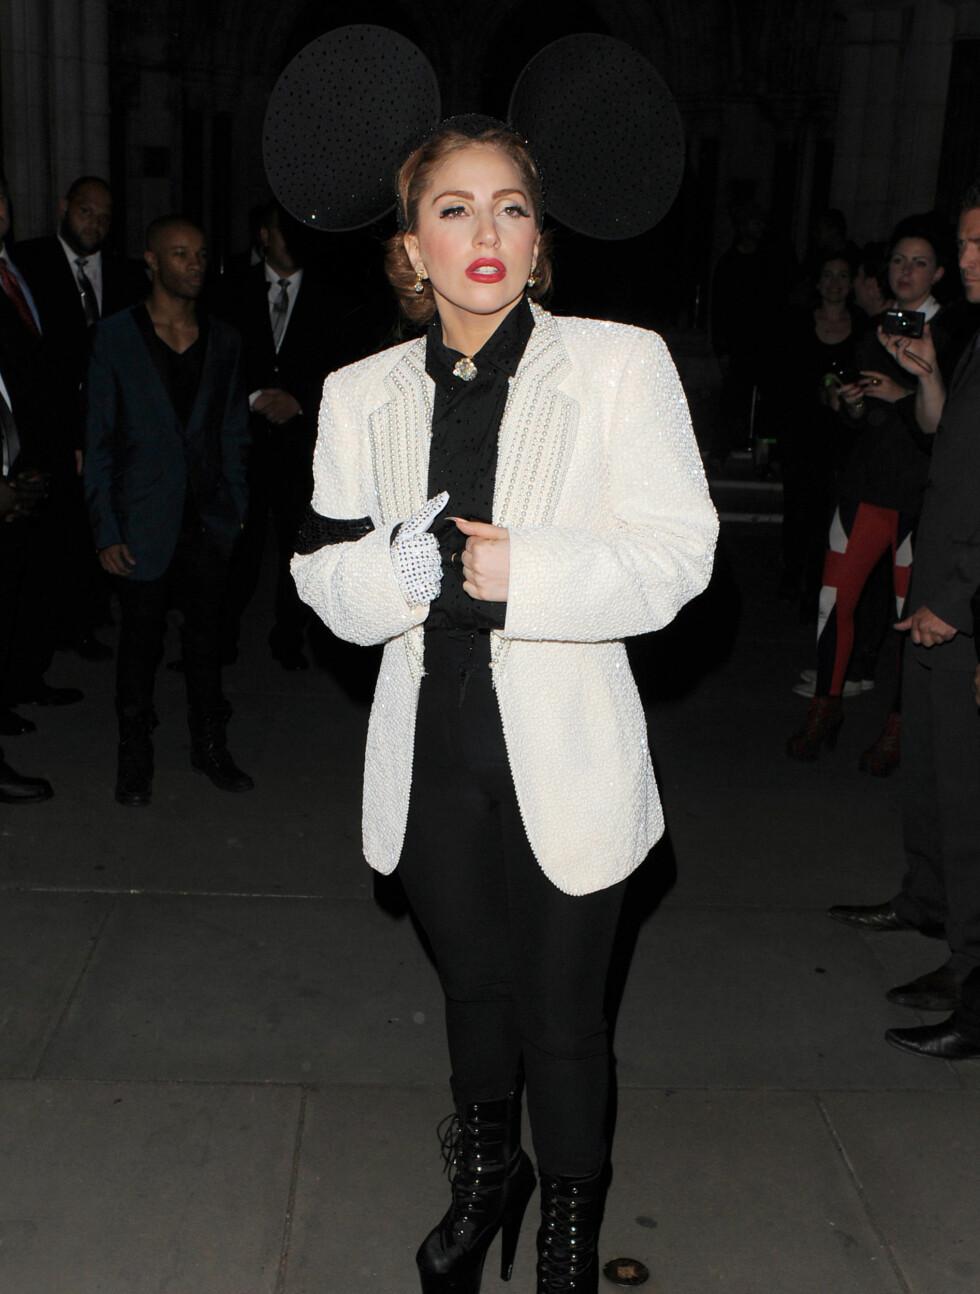 TO HELTER: Lady Gaga var inspirert av to populærkulturelle ikoner under London Fashion Week søndag - Michael Jackson (se hansken) og Mikke Mus. Foto: All Over Press